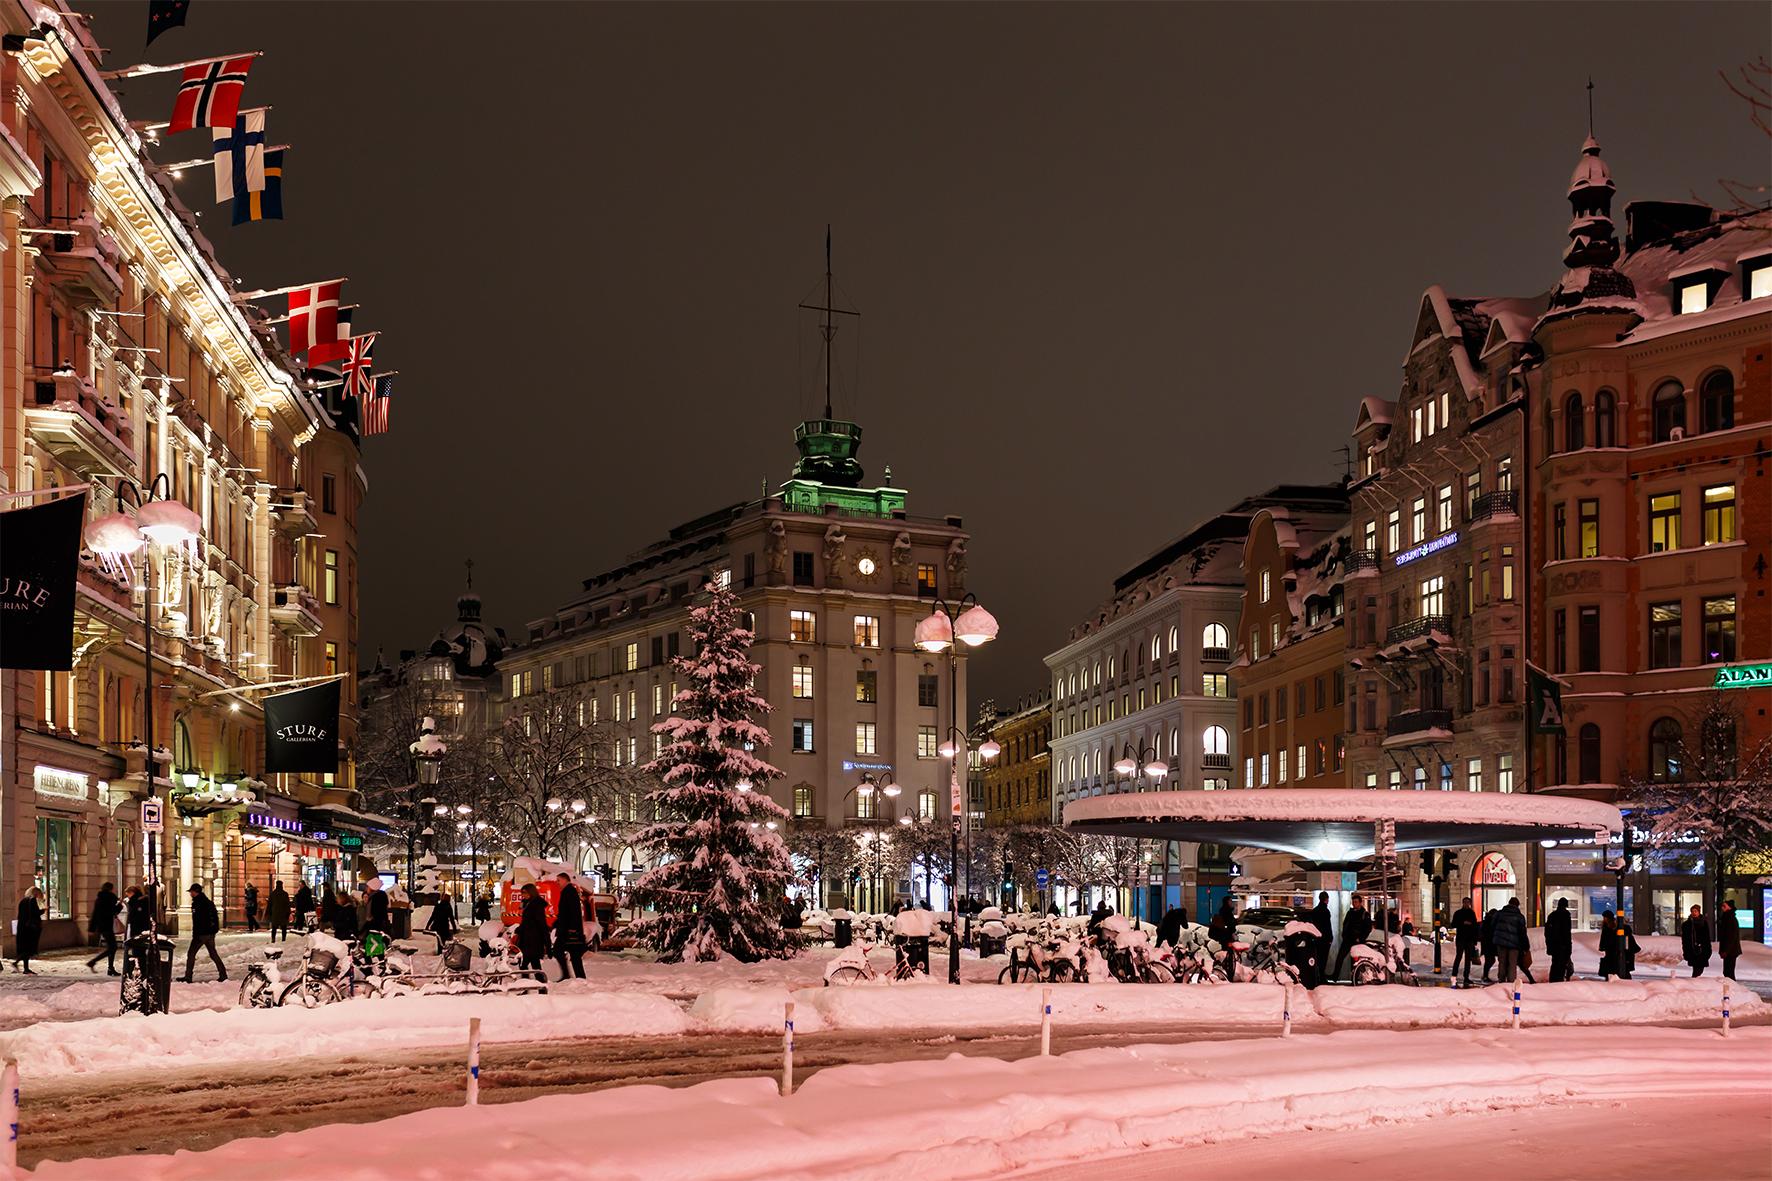 Stureplan, november 2016. Foto: Olof Bergqvist / Shutterstock.com